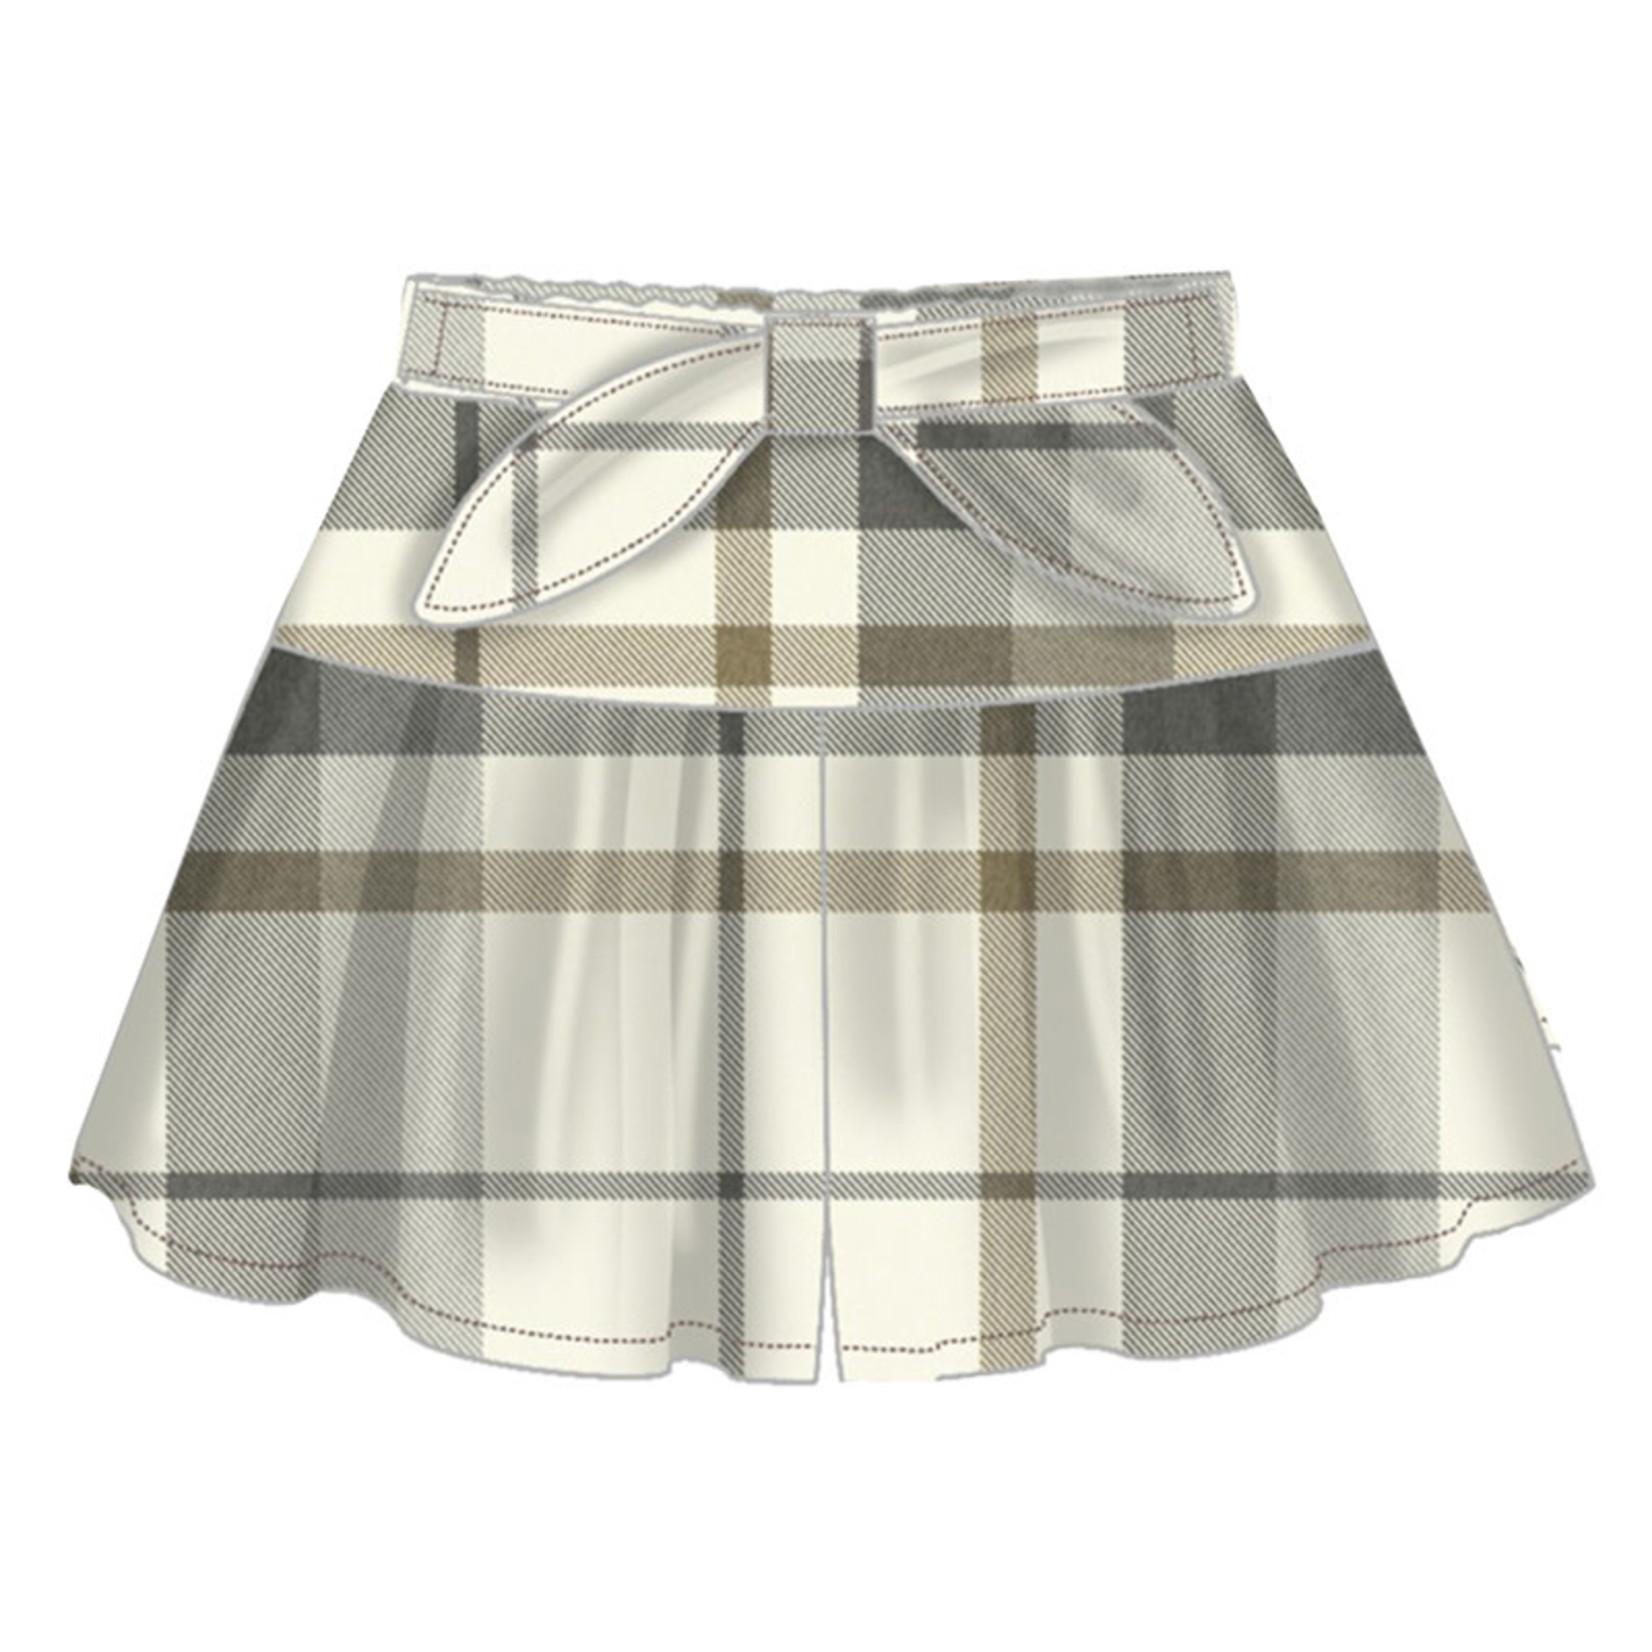 Mayoral Skirt Short Steel Lurex - Mayoral